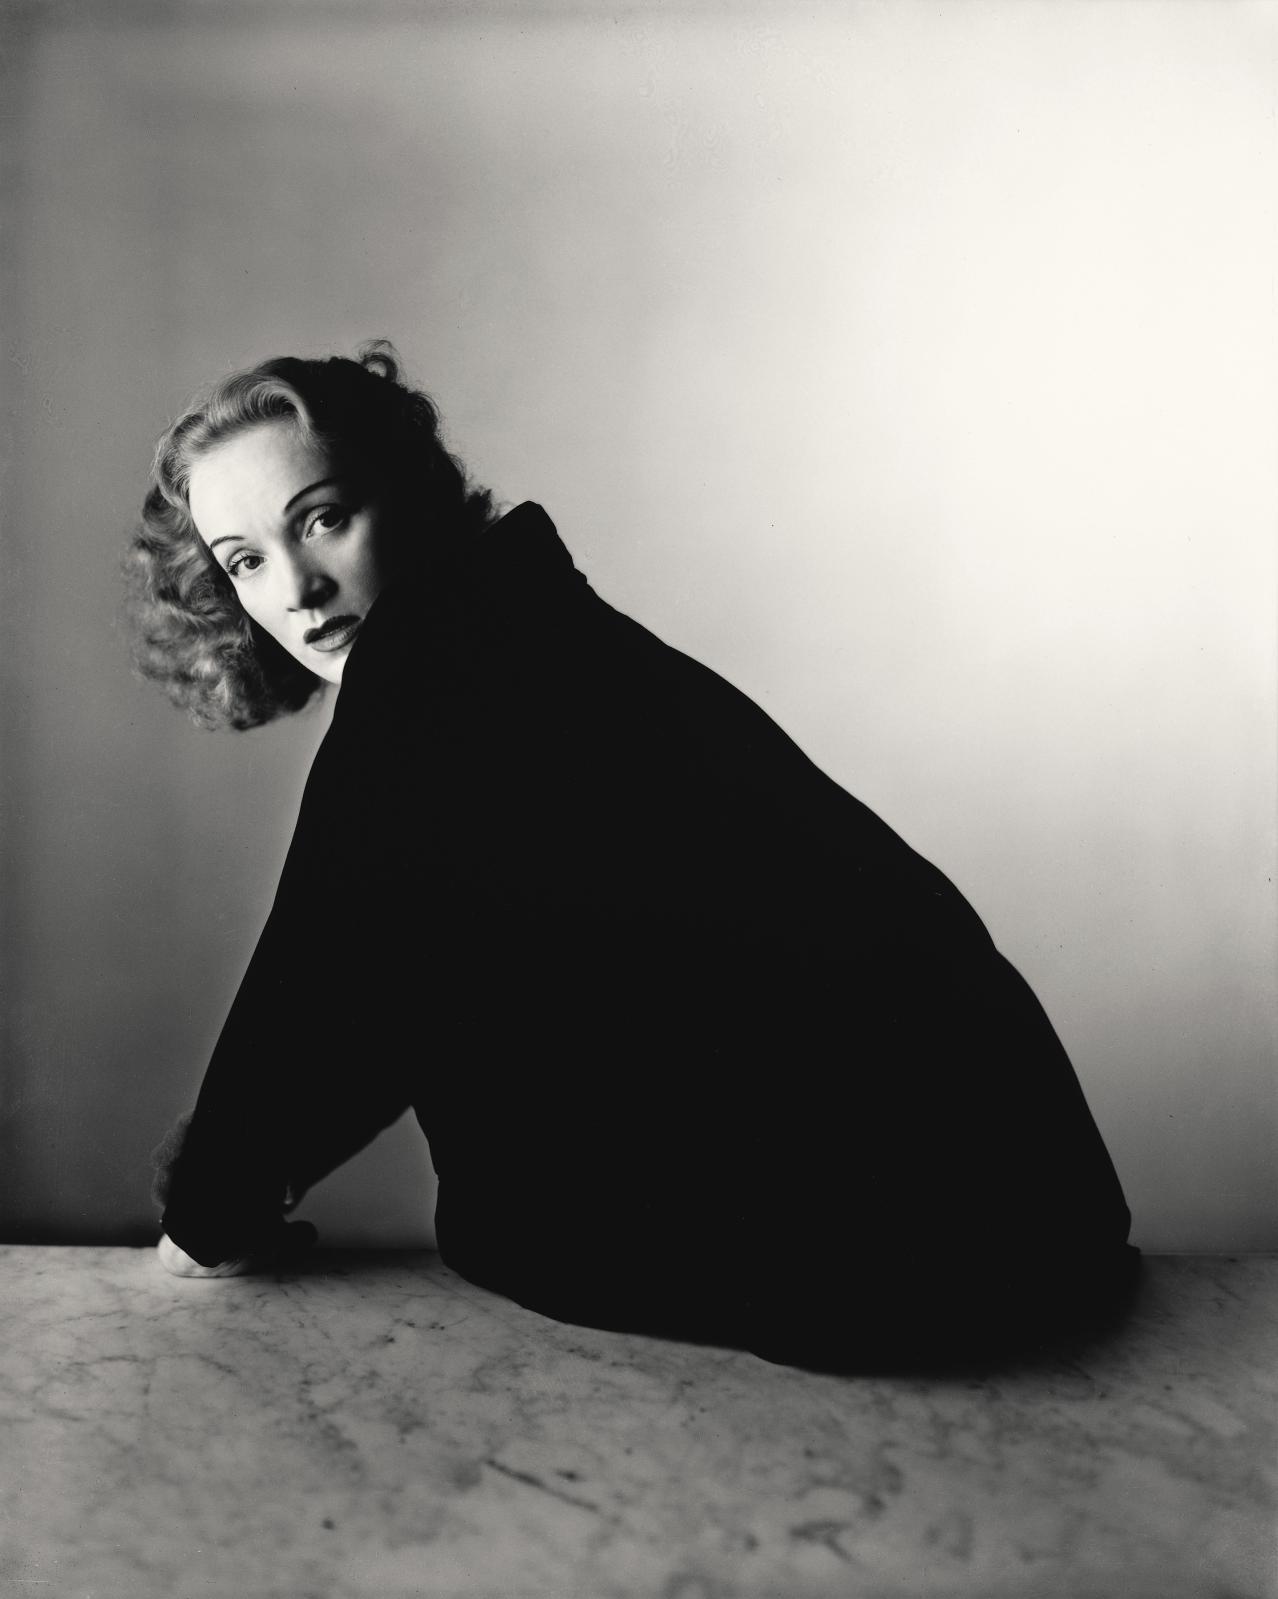 Marlene Dietrich, New York, 1948, épreuve gélatino-argentique, 2000, 25,4x20,6cm, The Metropolitan Museum of Art, New York, Promised Gift of The Ir